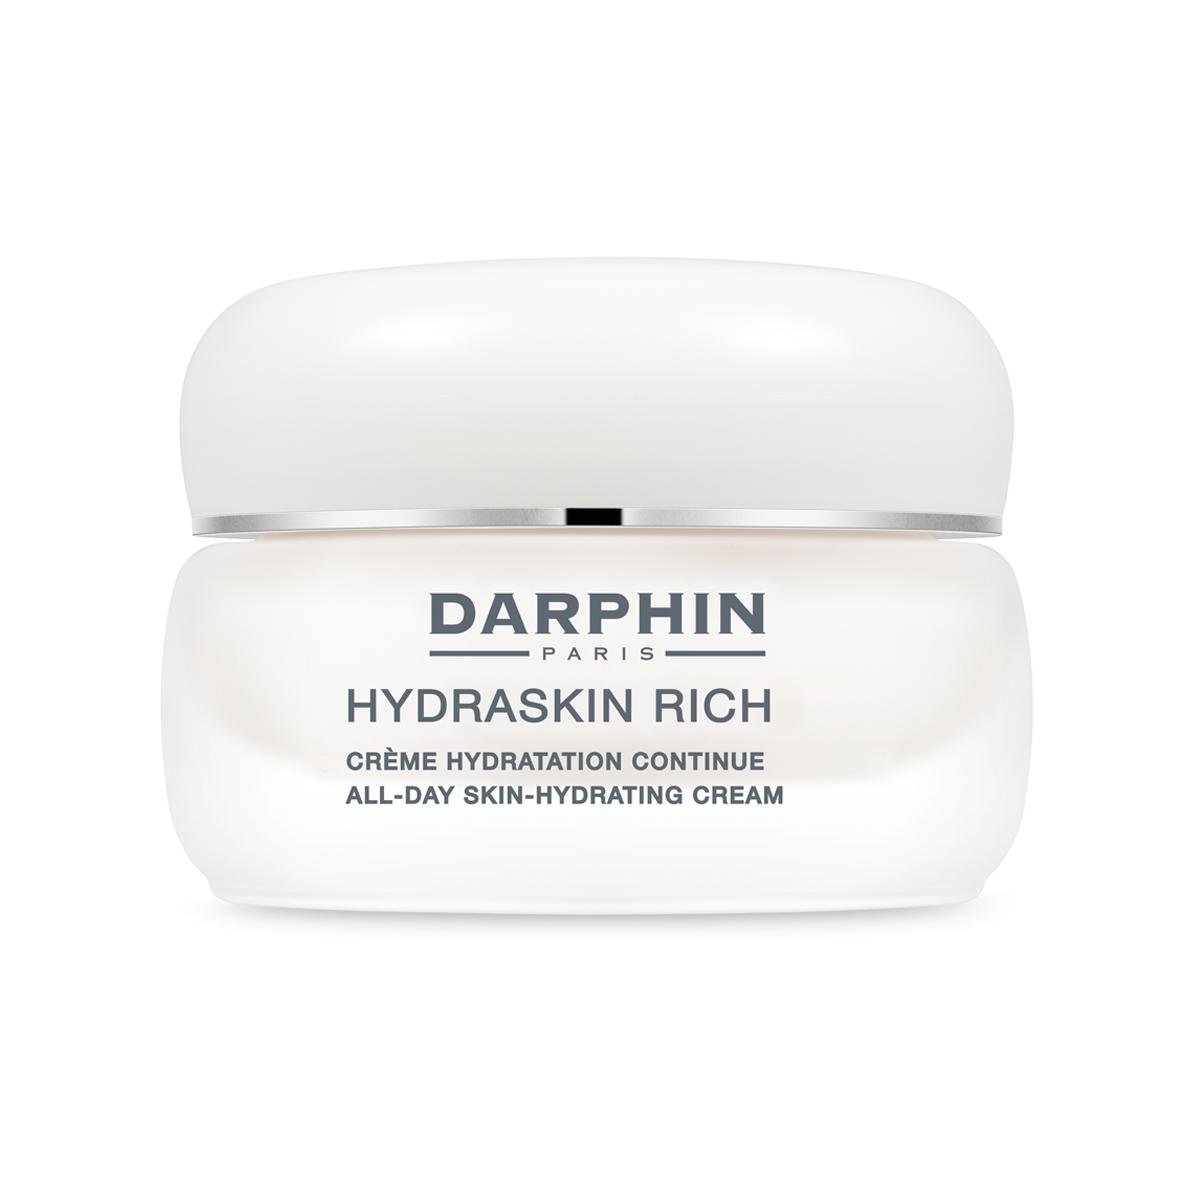 Hydraskin Rich Cream